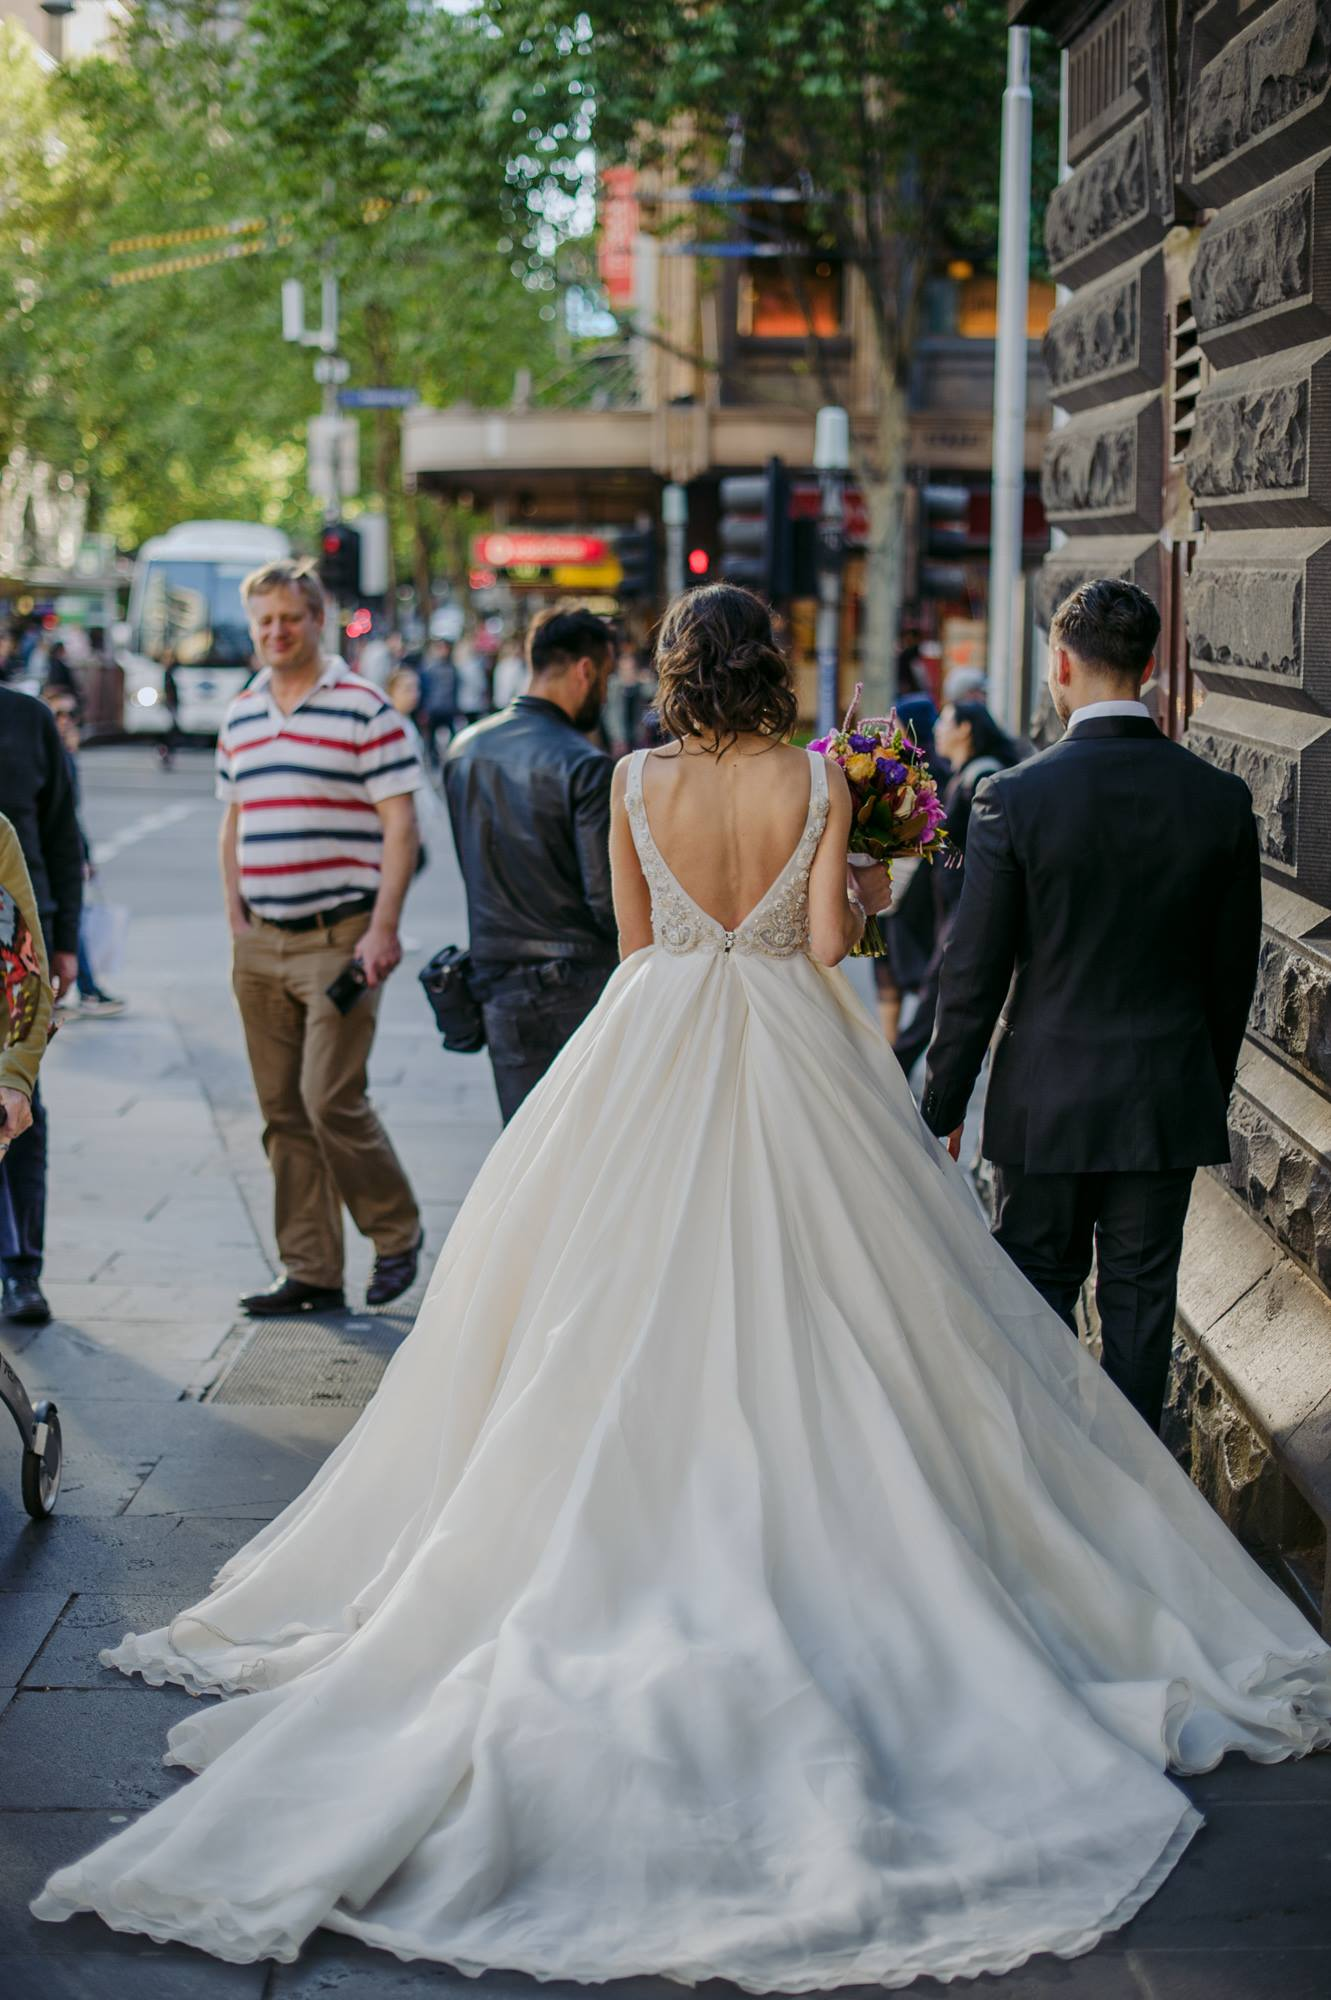 backless wedding dress.jpg